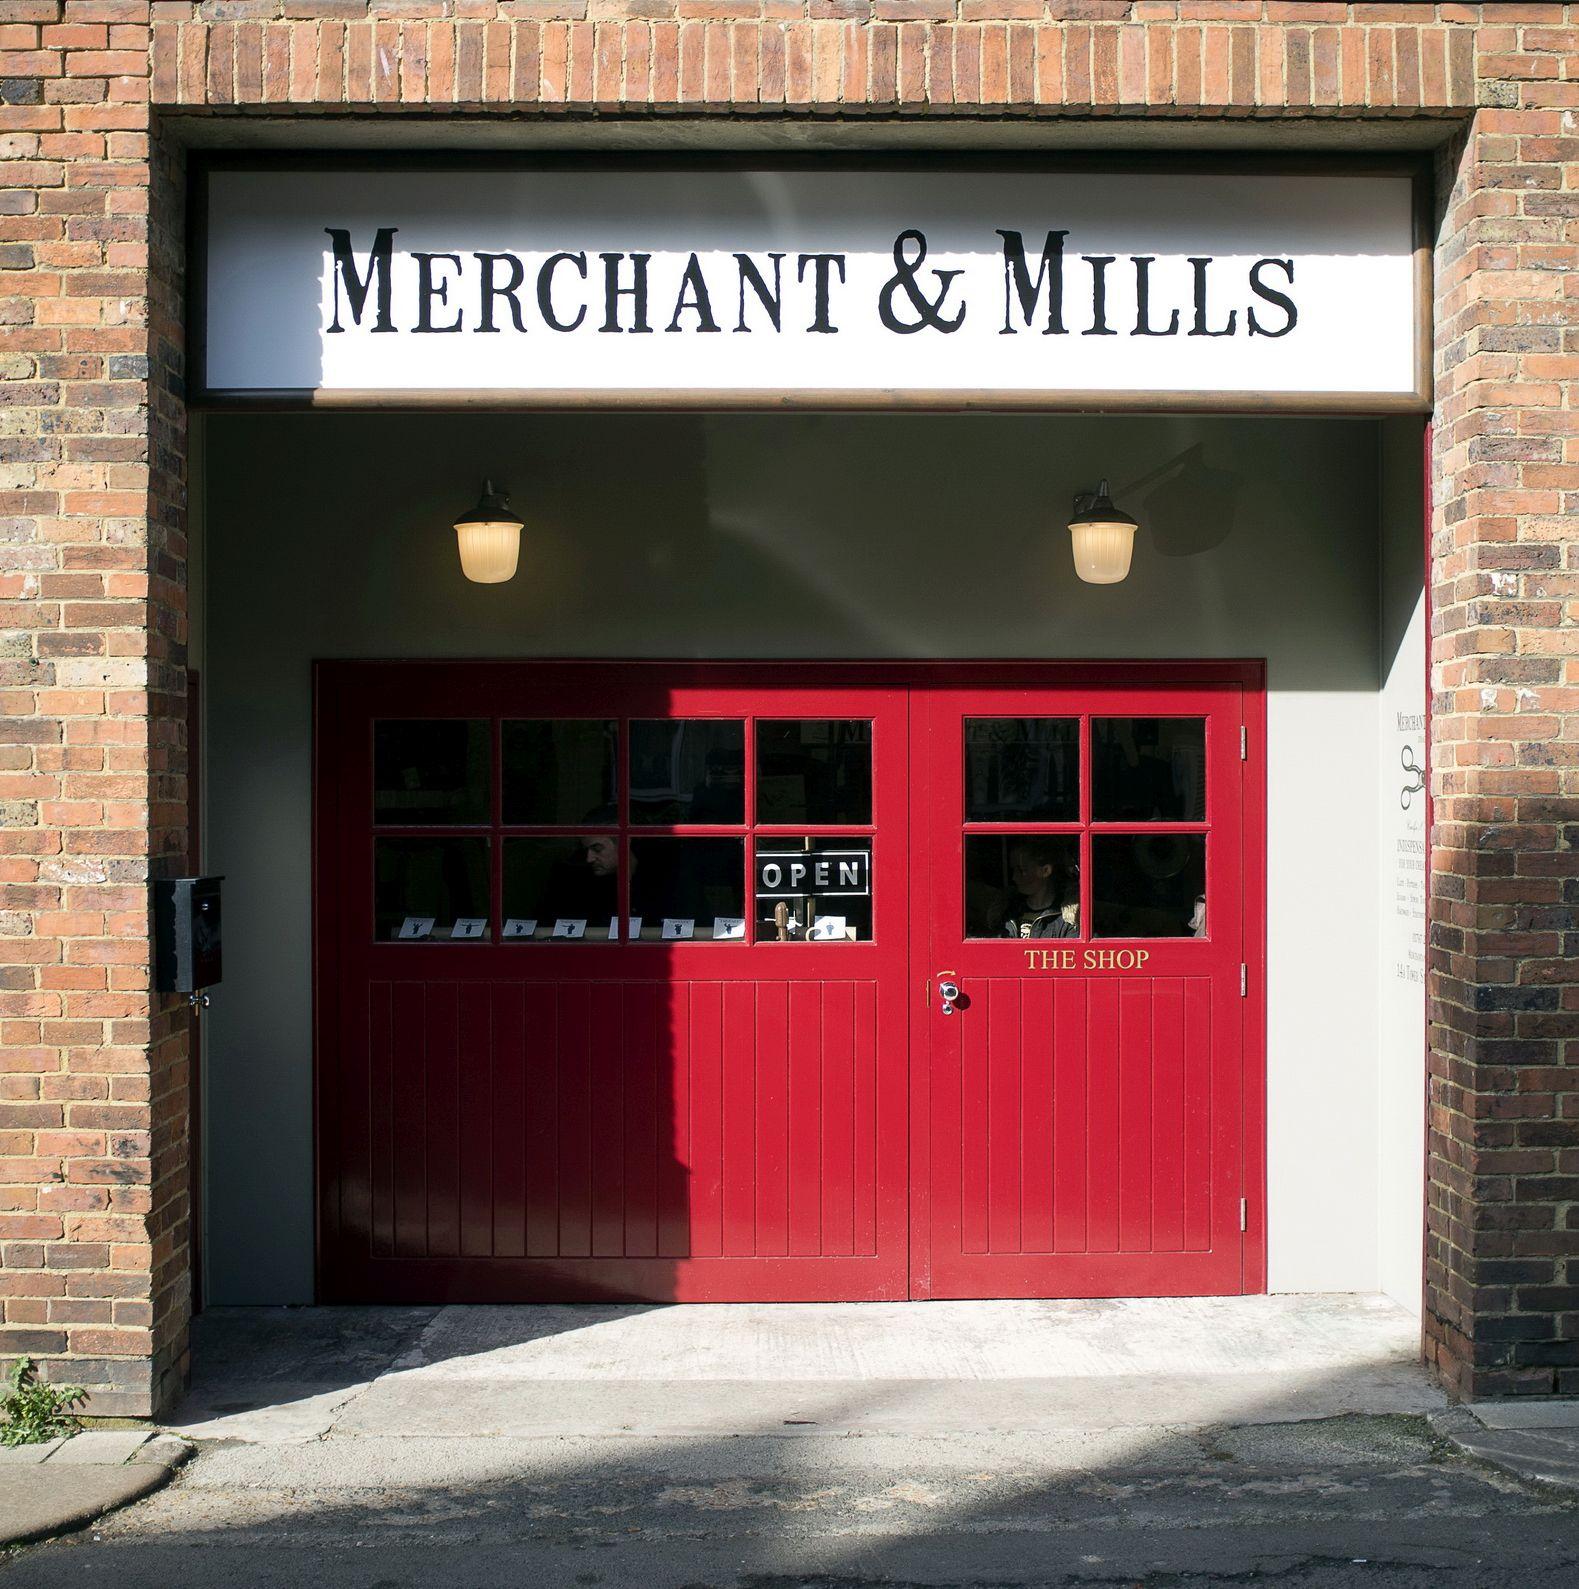 Shop front of Merchant & Mills store in Rye